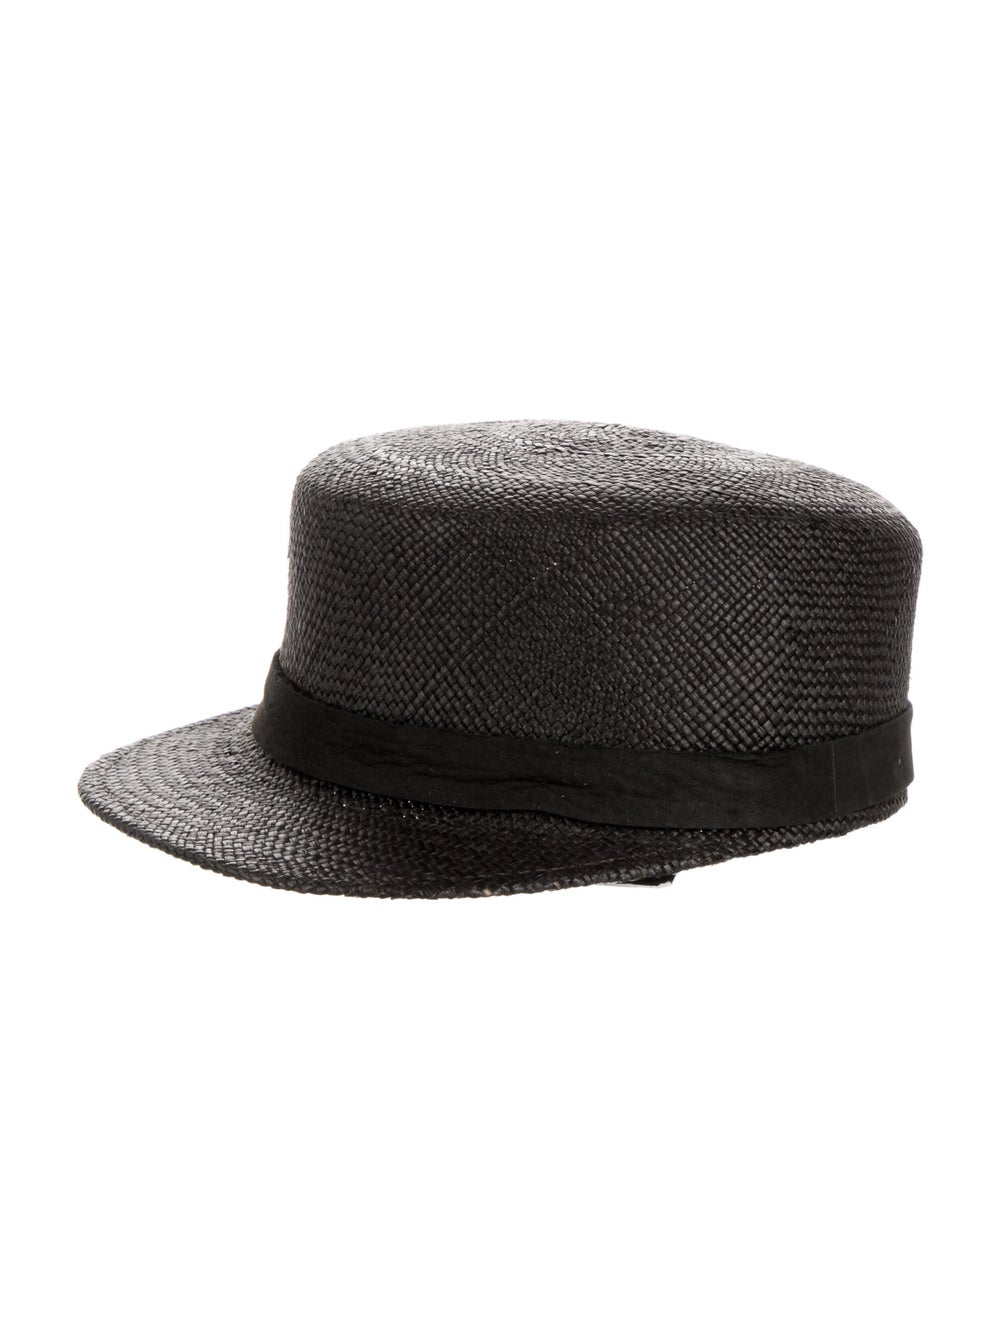 Janessa Leone Grey Straw Messenger Hat w/ Tags Gr… - image 2